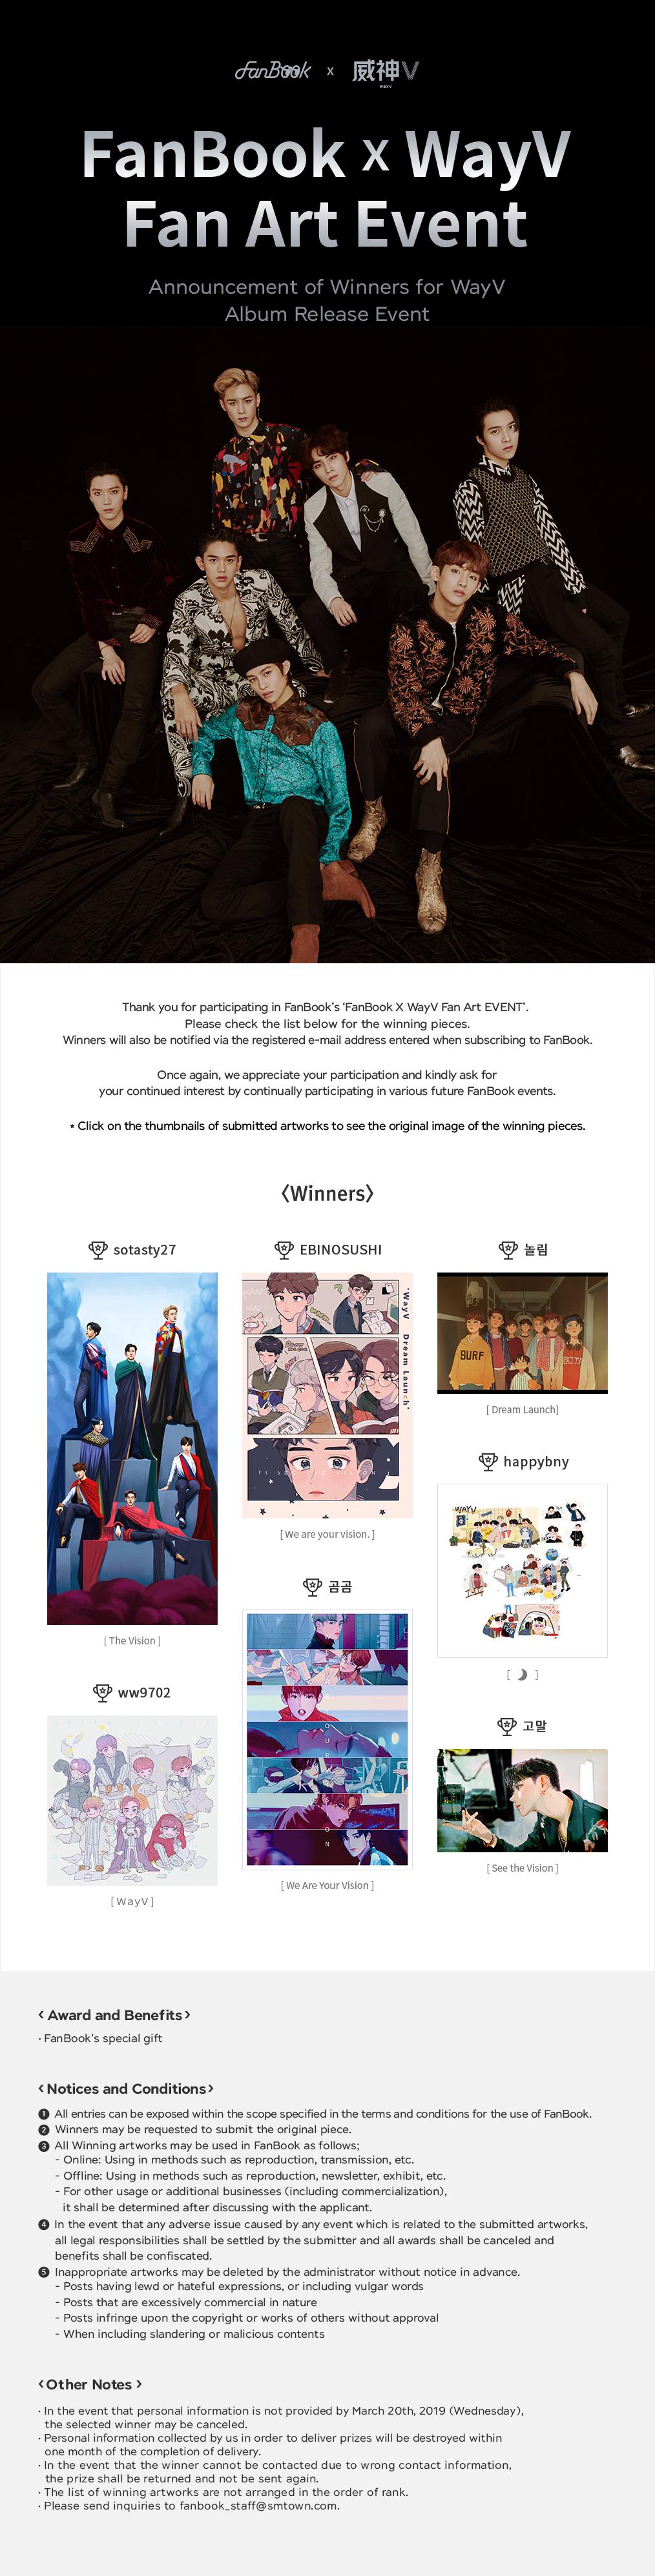 FanBook X WayV Fan Art Event